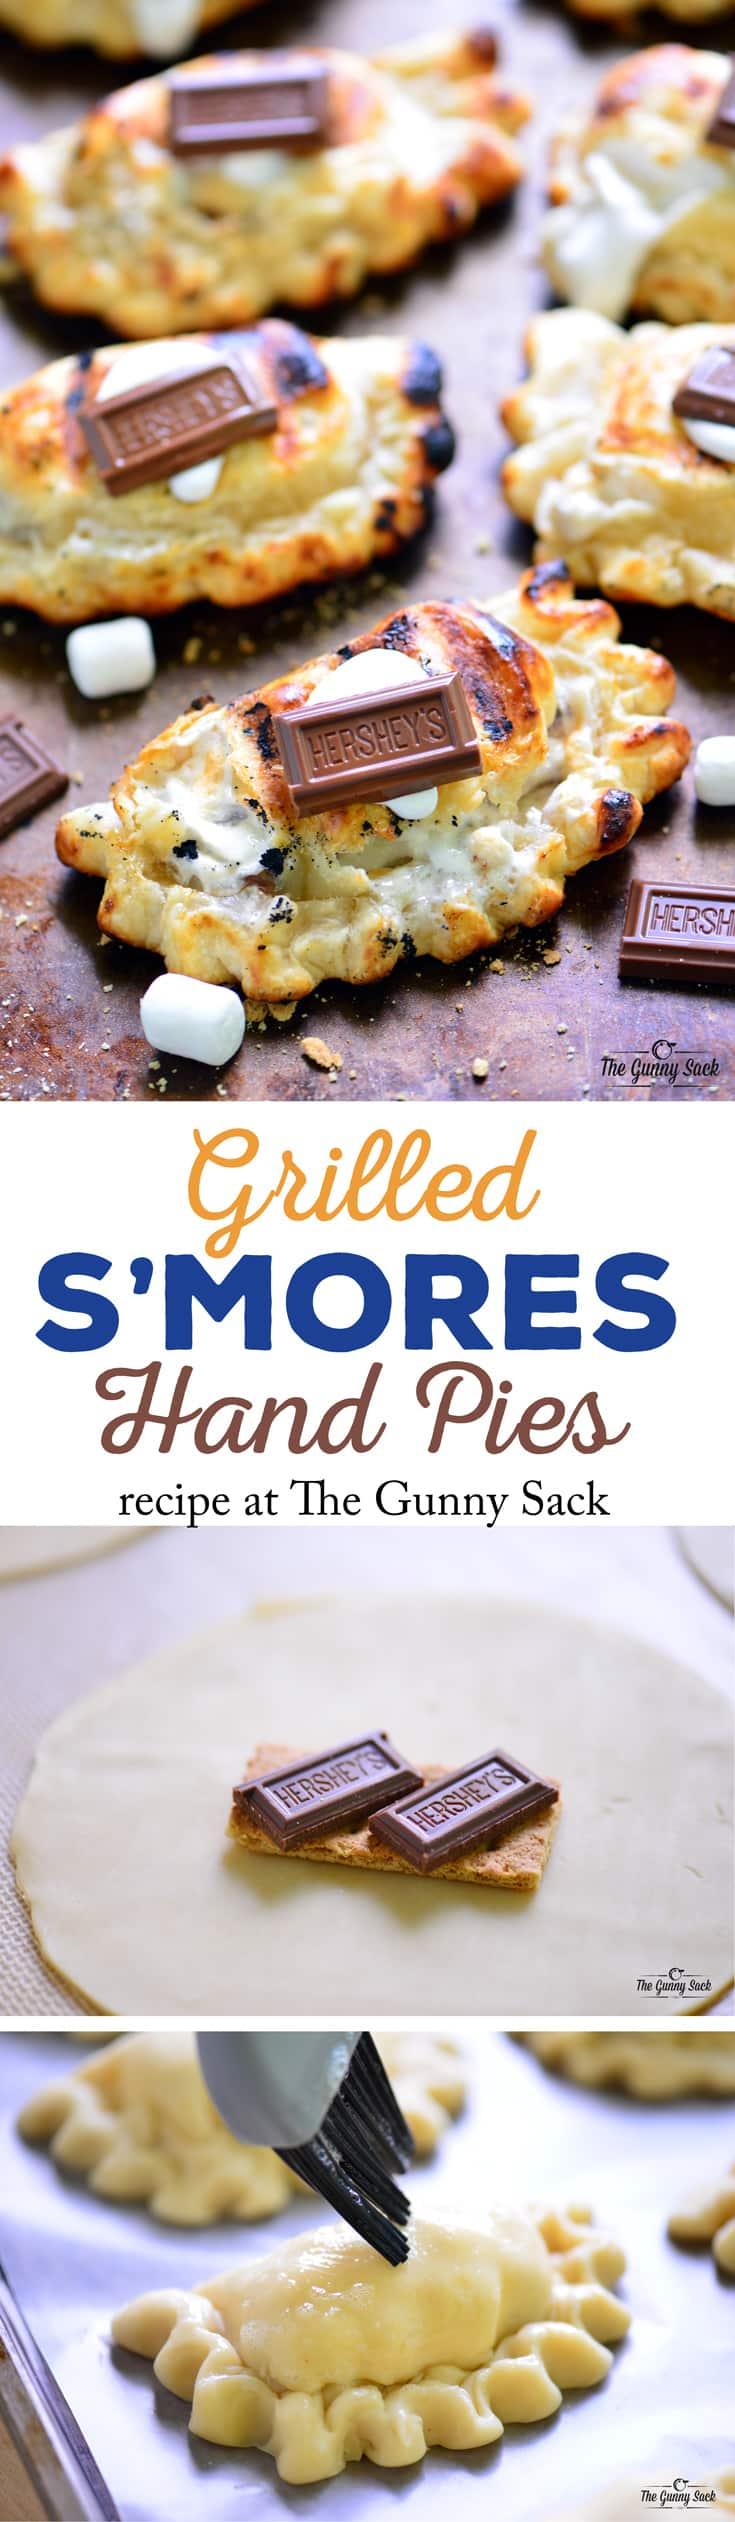 Grilled S'mores Hand Pies Recipe | thegunnysack.com